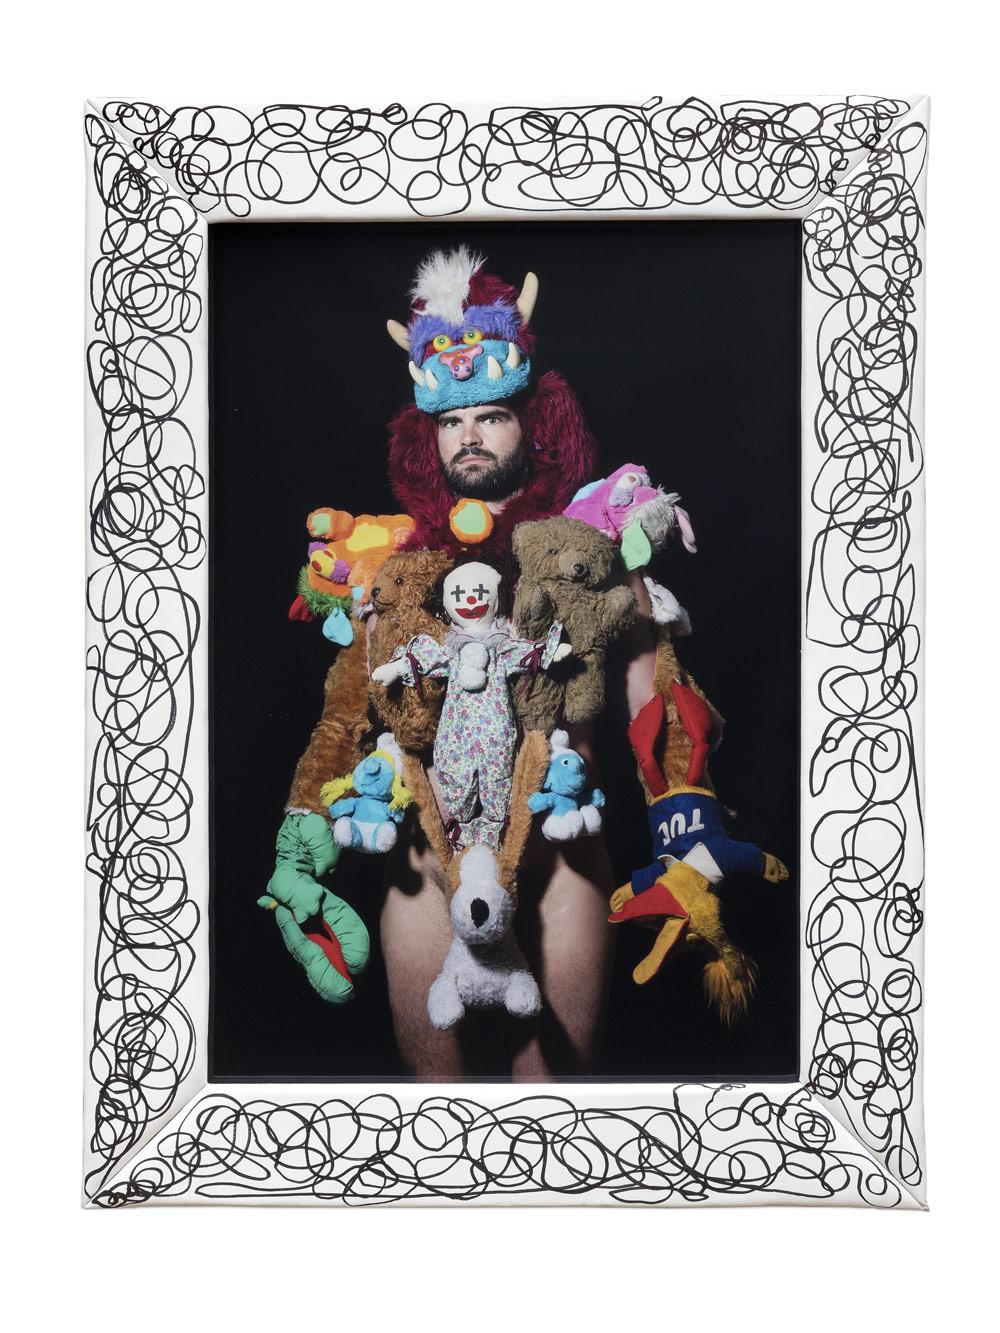 James Ostrer Finding Me Through You 2018 Digital archival print permanent marker on canvas 100 × 69 cm framed 129 5 × 965 × 5 cm Edition of 3 1 AP unique frame 1